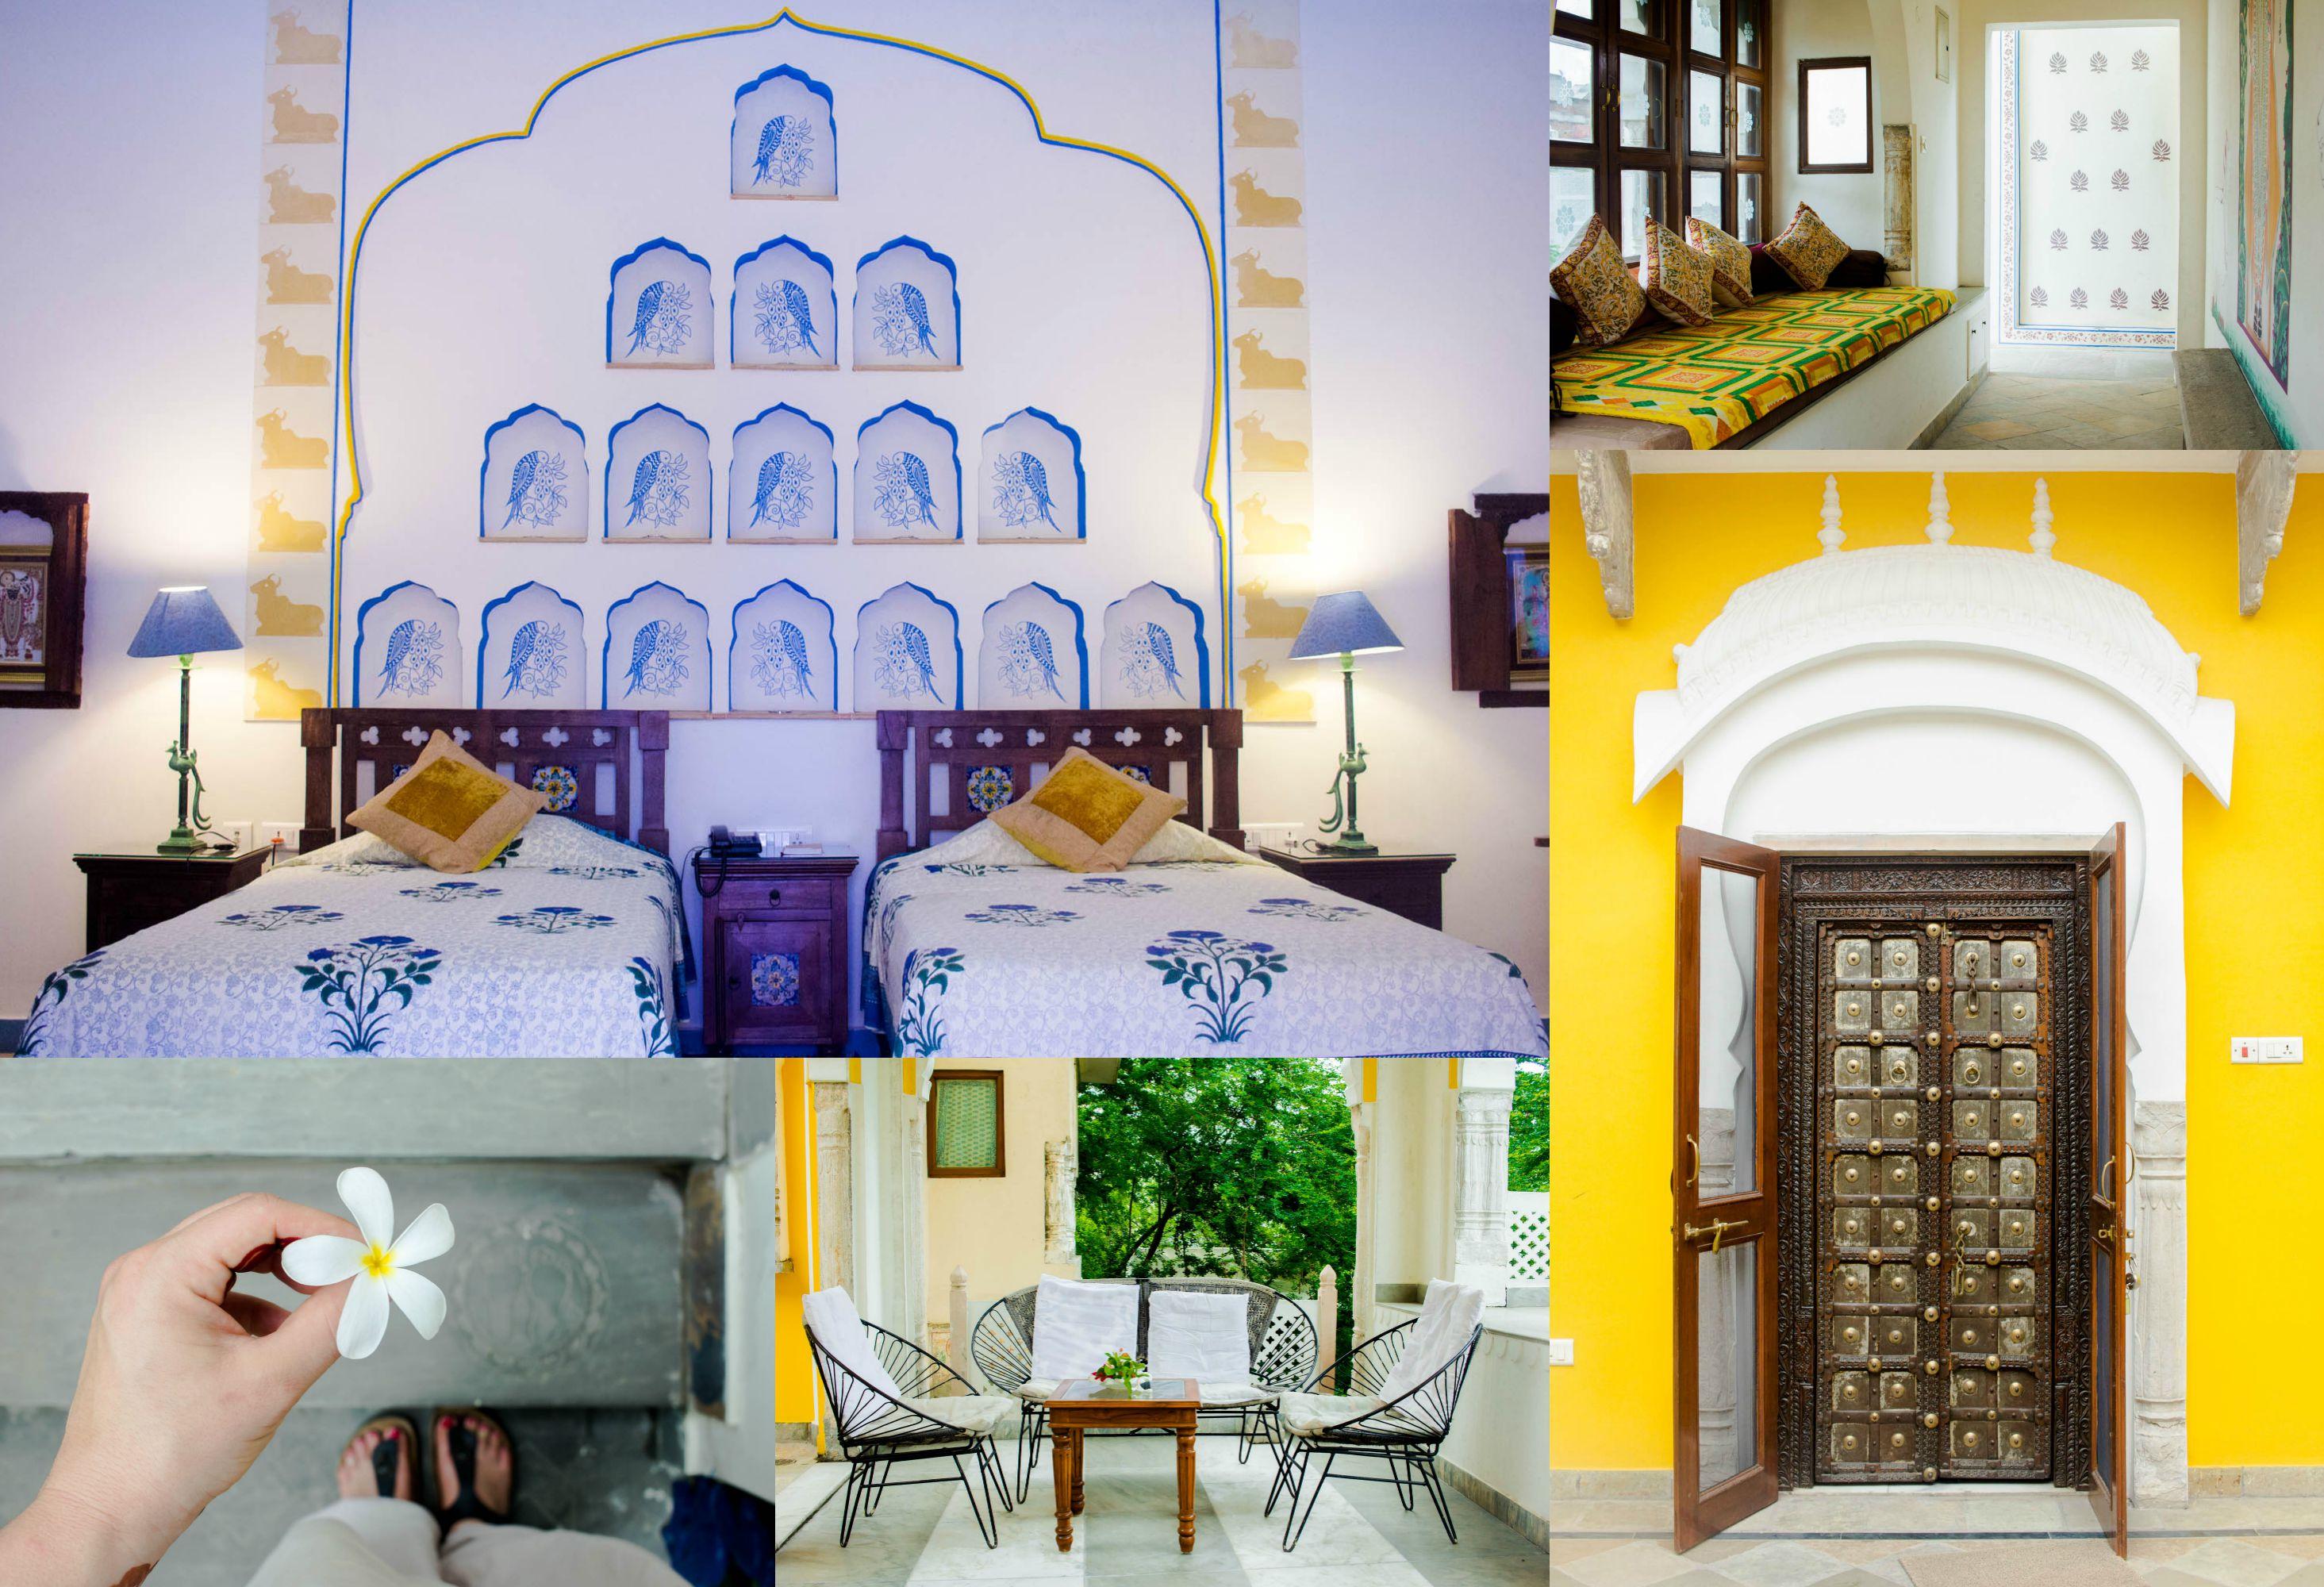 golden triangle rajasthan taj mahal jaipur delhi india tips must see kathi kamleitner travelettes-dera mandawa